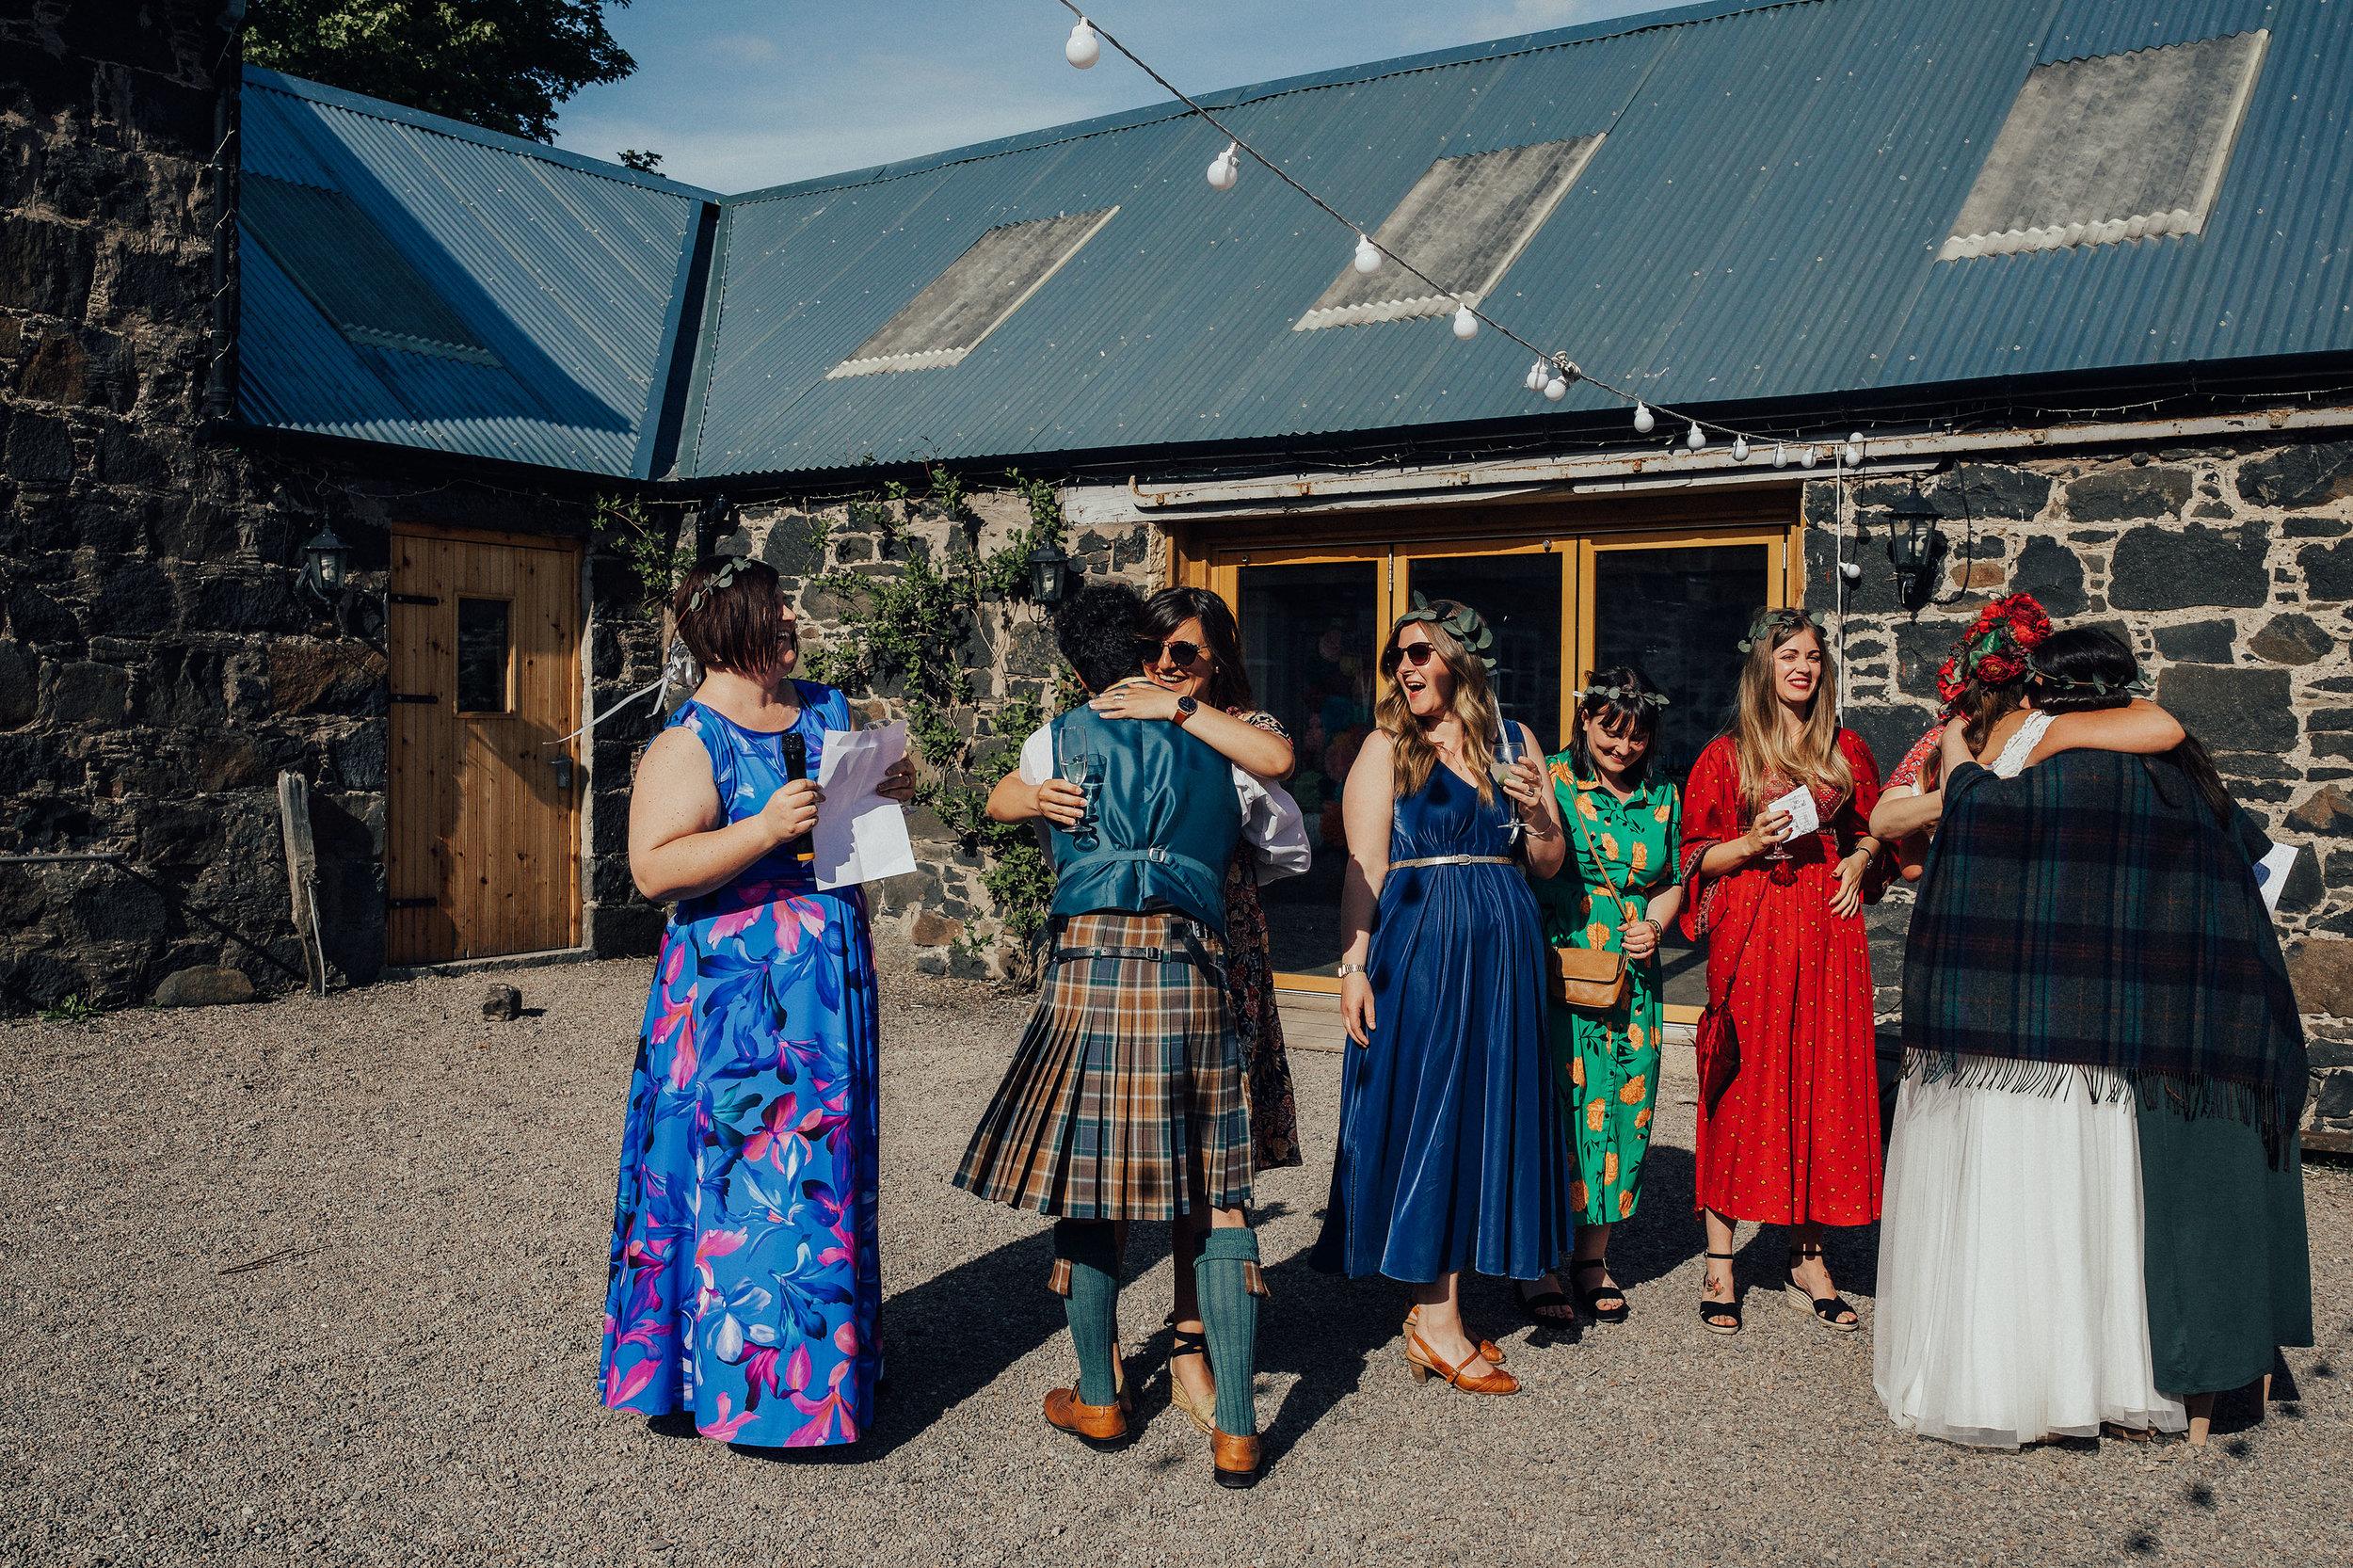 COMRIE_CROFT_WEDDINGS_PJ_PHILLIPS_PHOTOGRAPHY_133.jpg